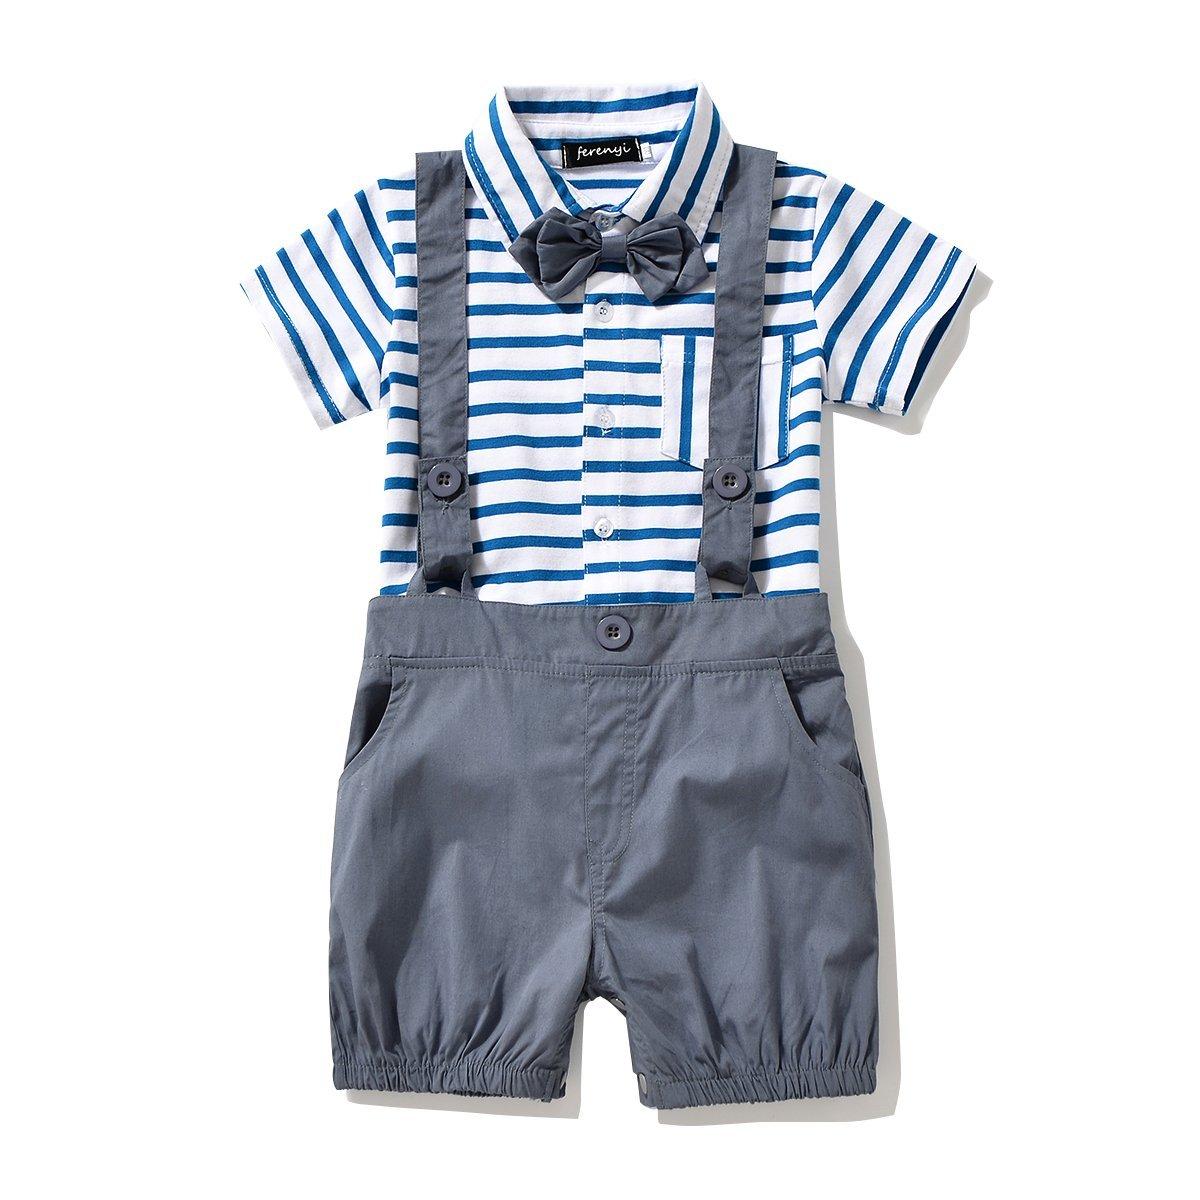 FERENYI APPAREL ベビーボーイズ B01GVITKHS ブルー 0-6 months 0-6 months|ブルー